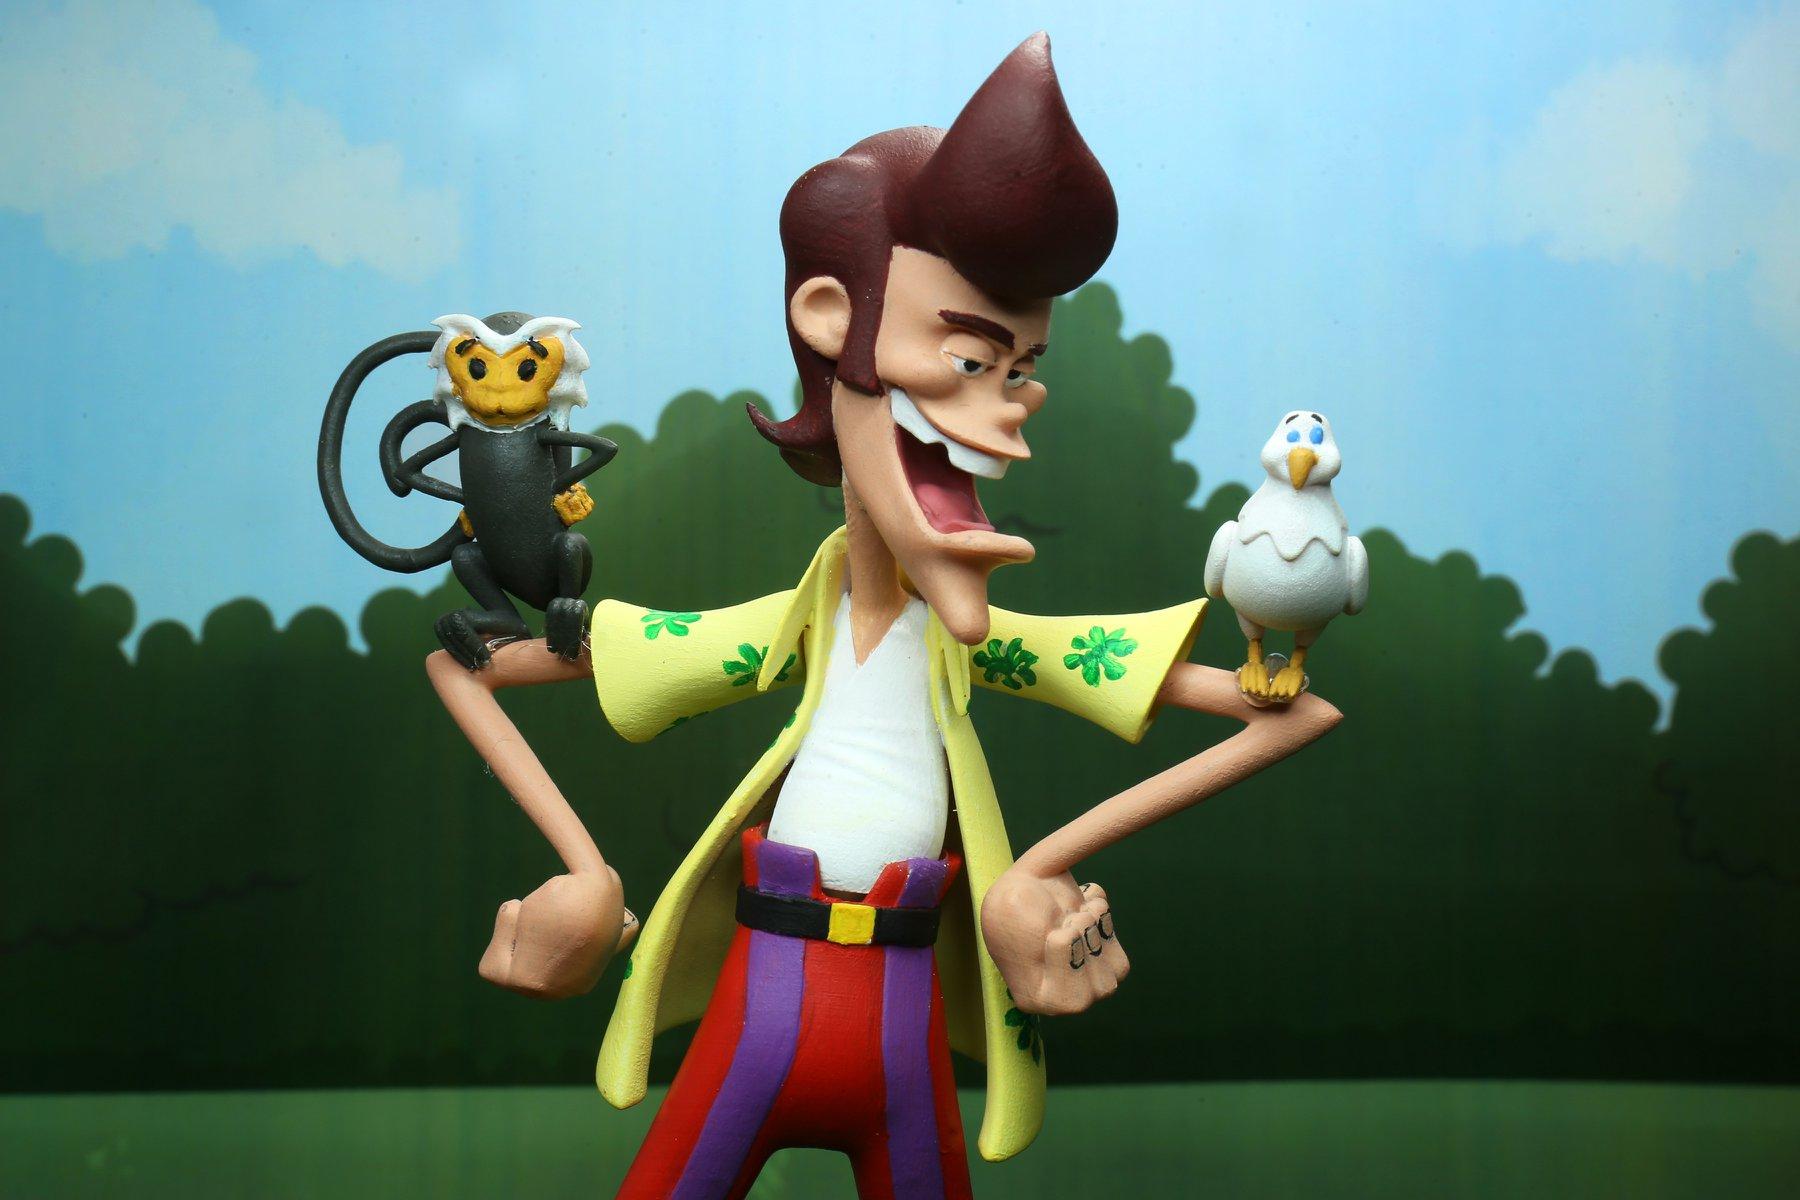 NECA Toys Announces Toony Classic Ace Ventura Figure